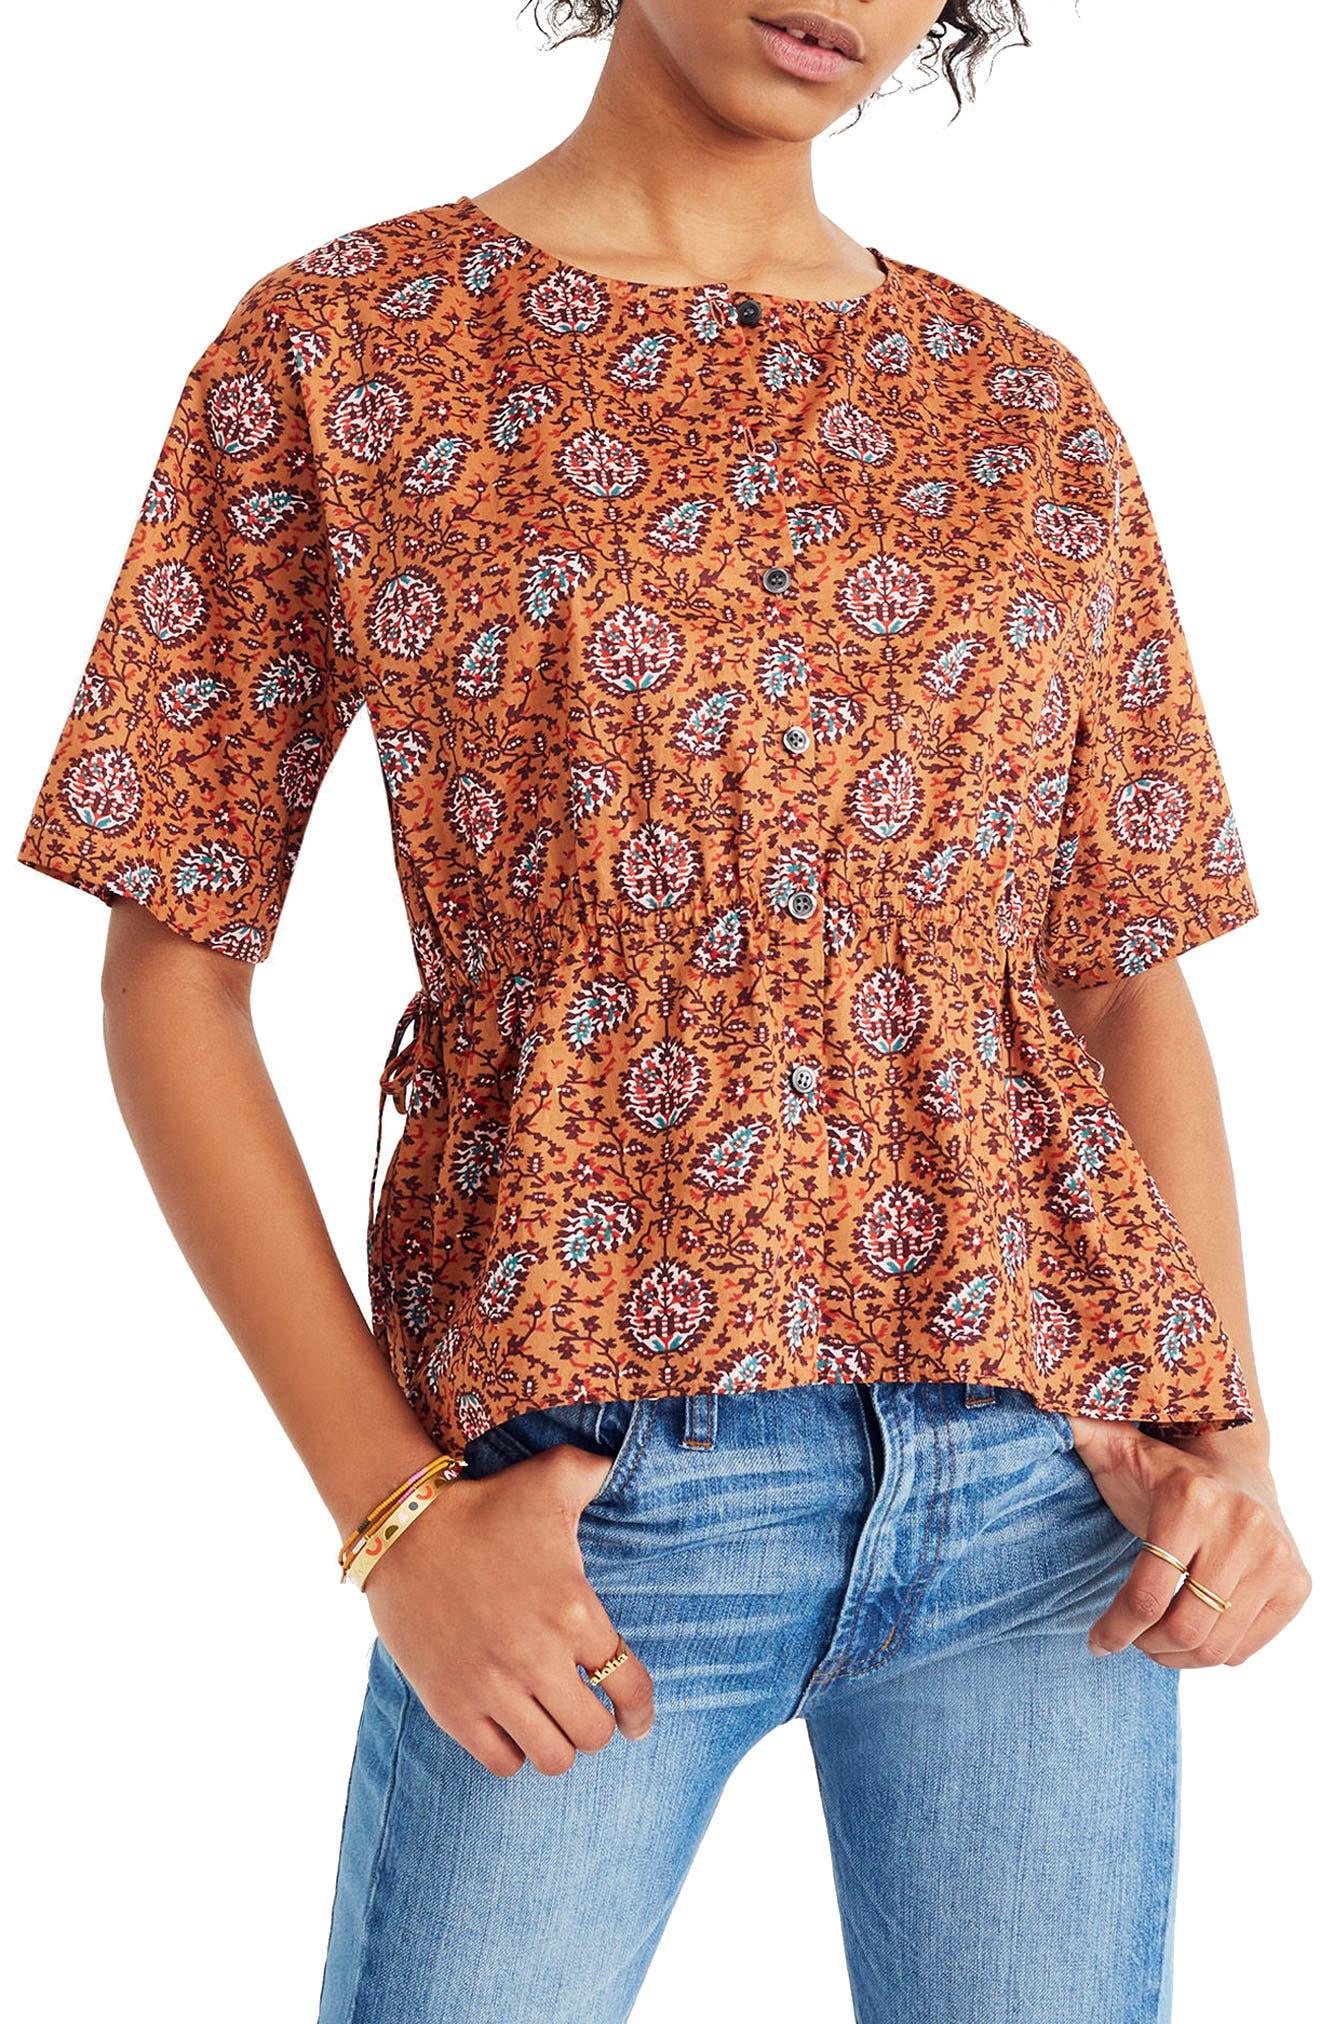 Drawstring Waist Shirt,                         Main,                         color, Burnt Sienna